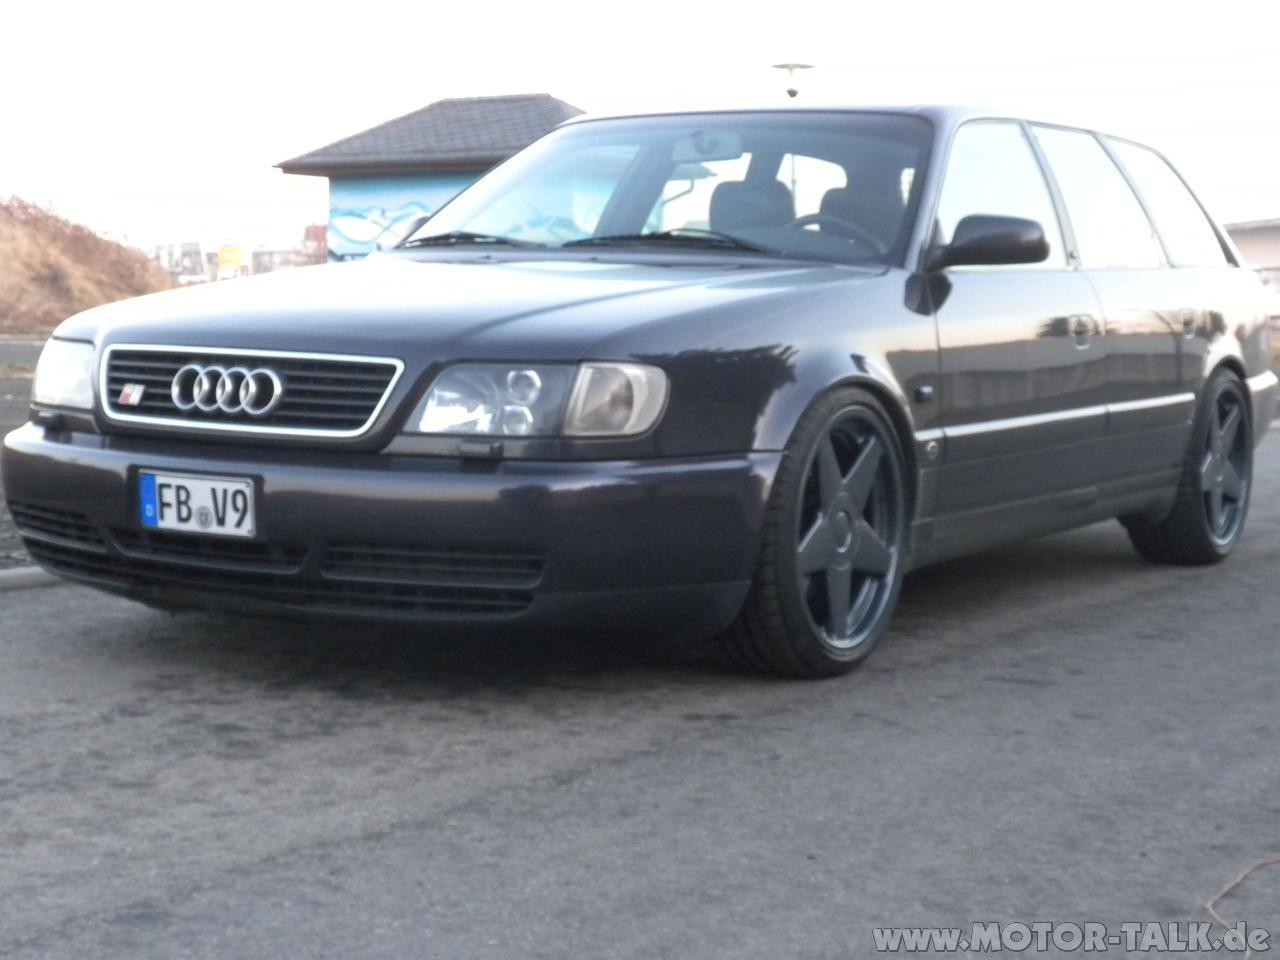 Audi-S6-C4-8